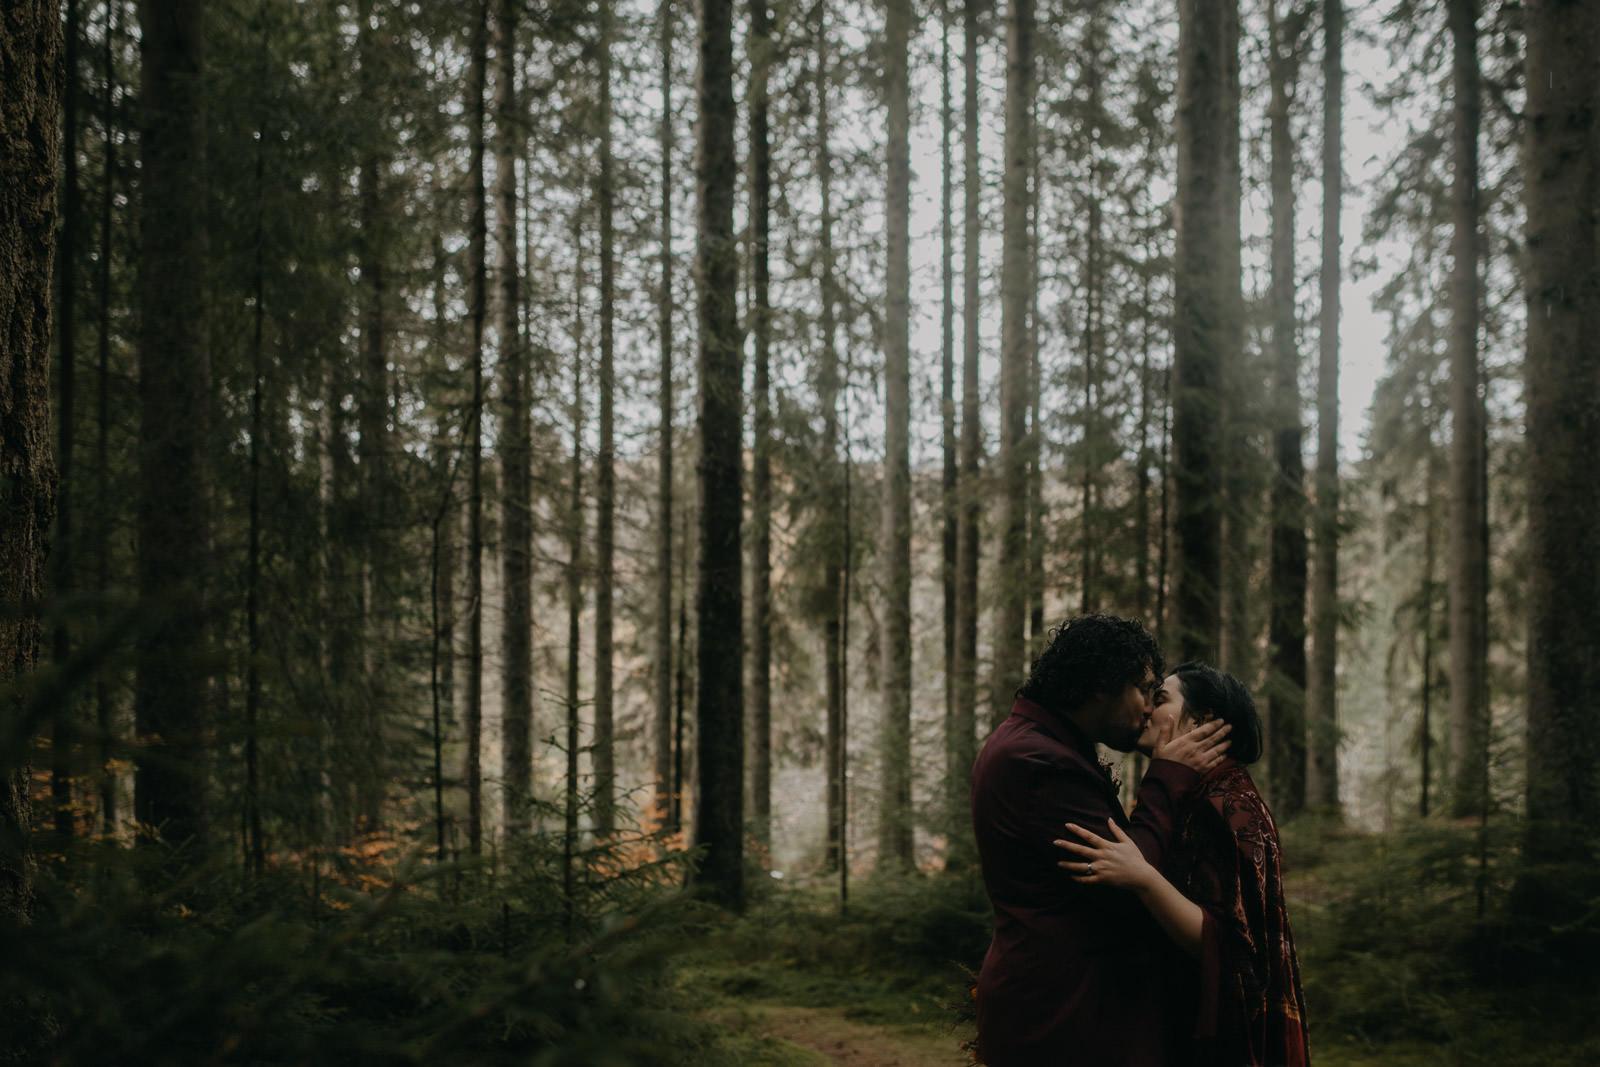 Below The Trees by Raini Rowell